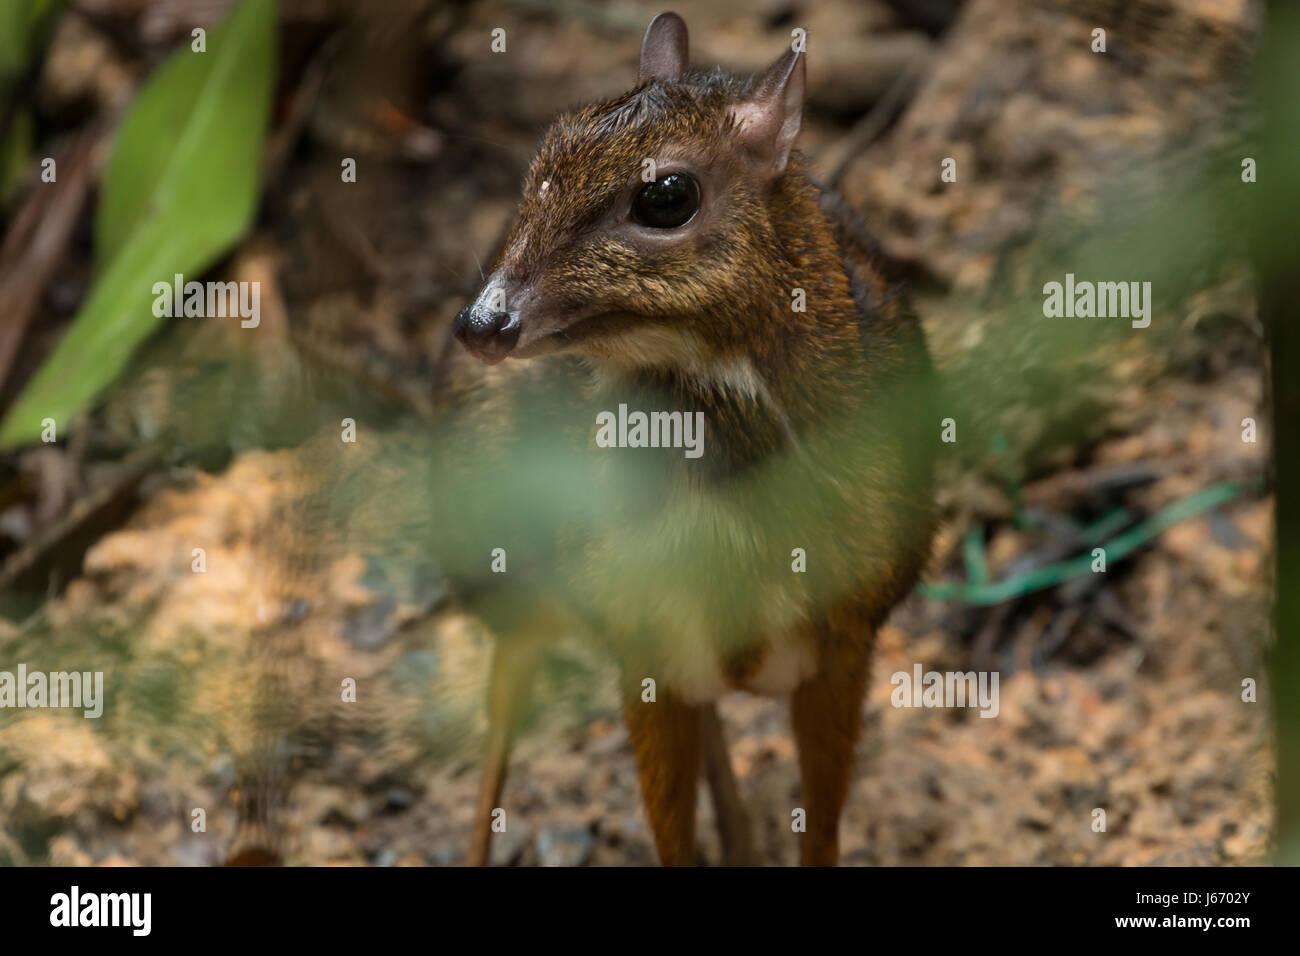 Tímido ratón ciervo (Chevrotain) ocultar detrás de Bush en Singapur. Imagen De Stock